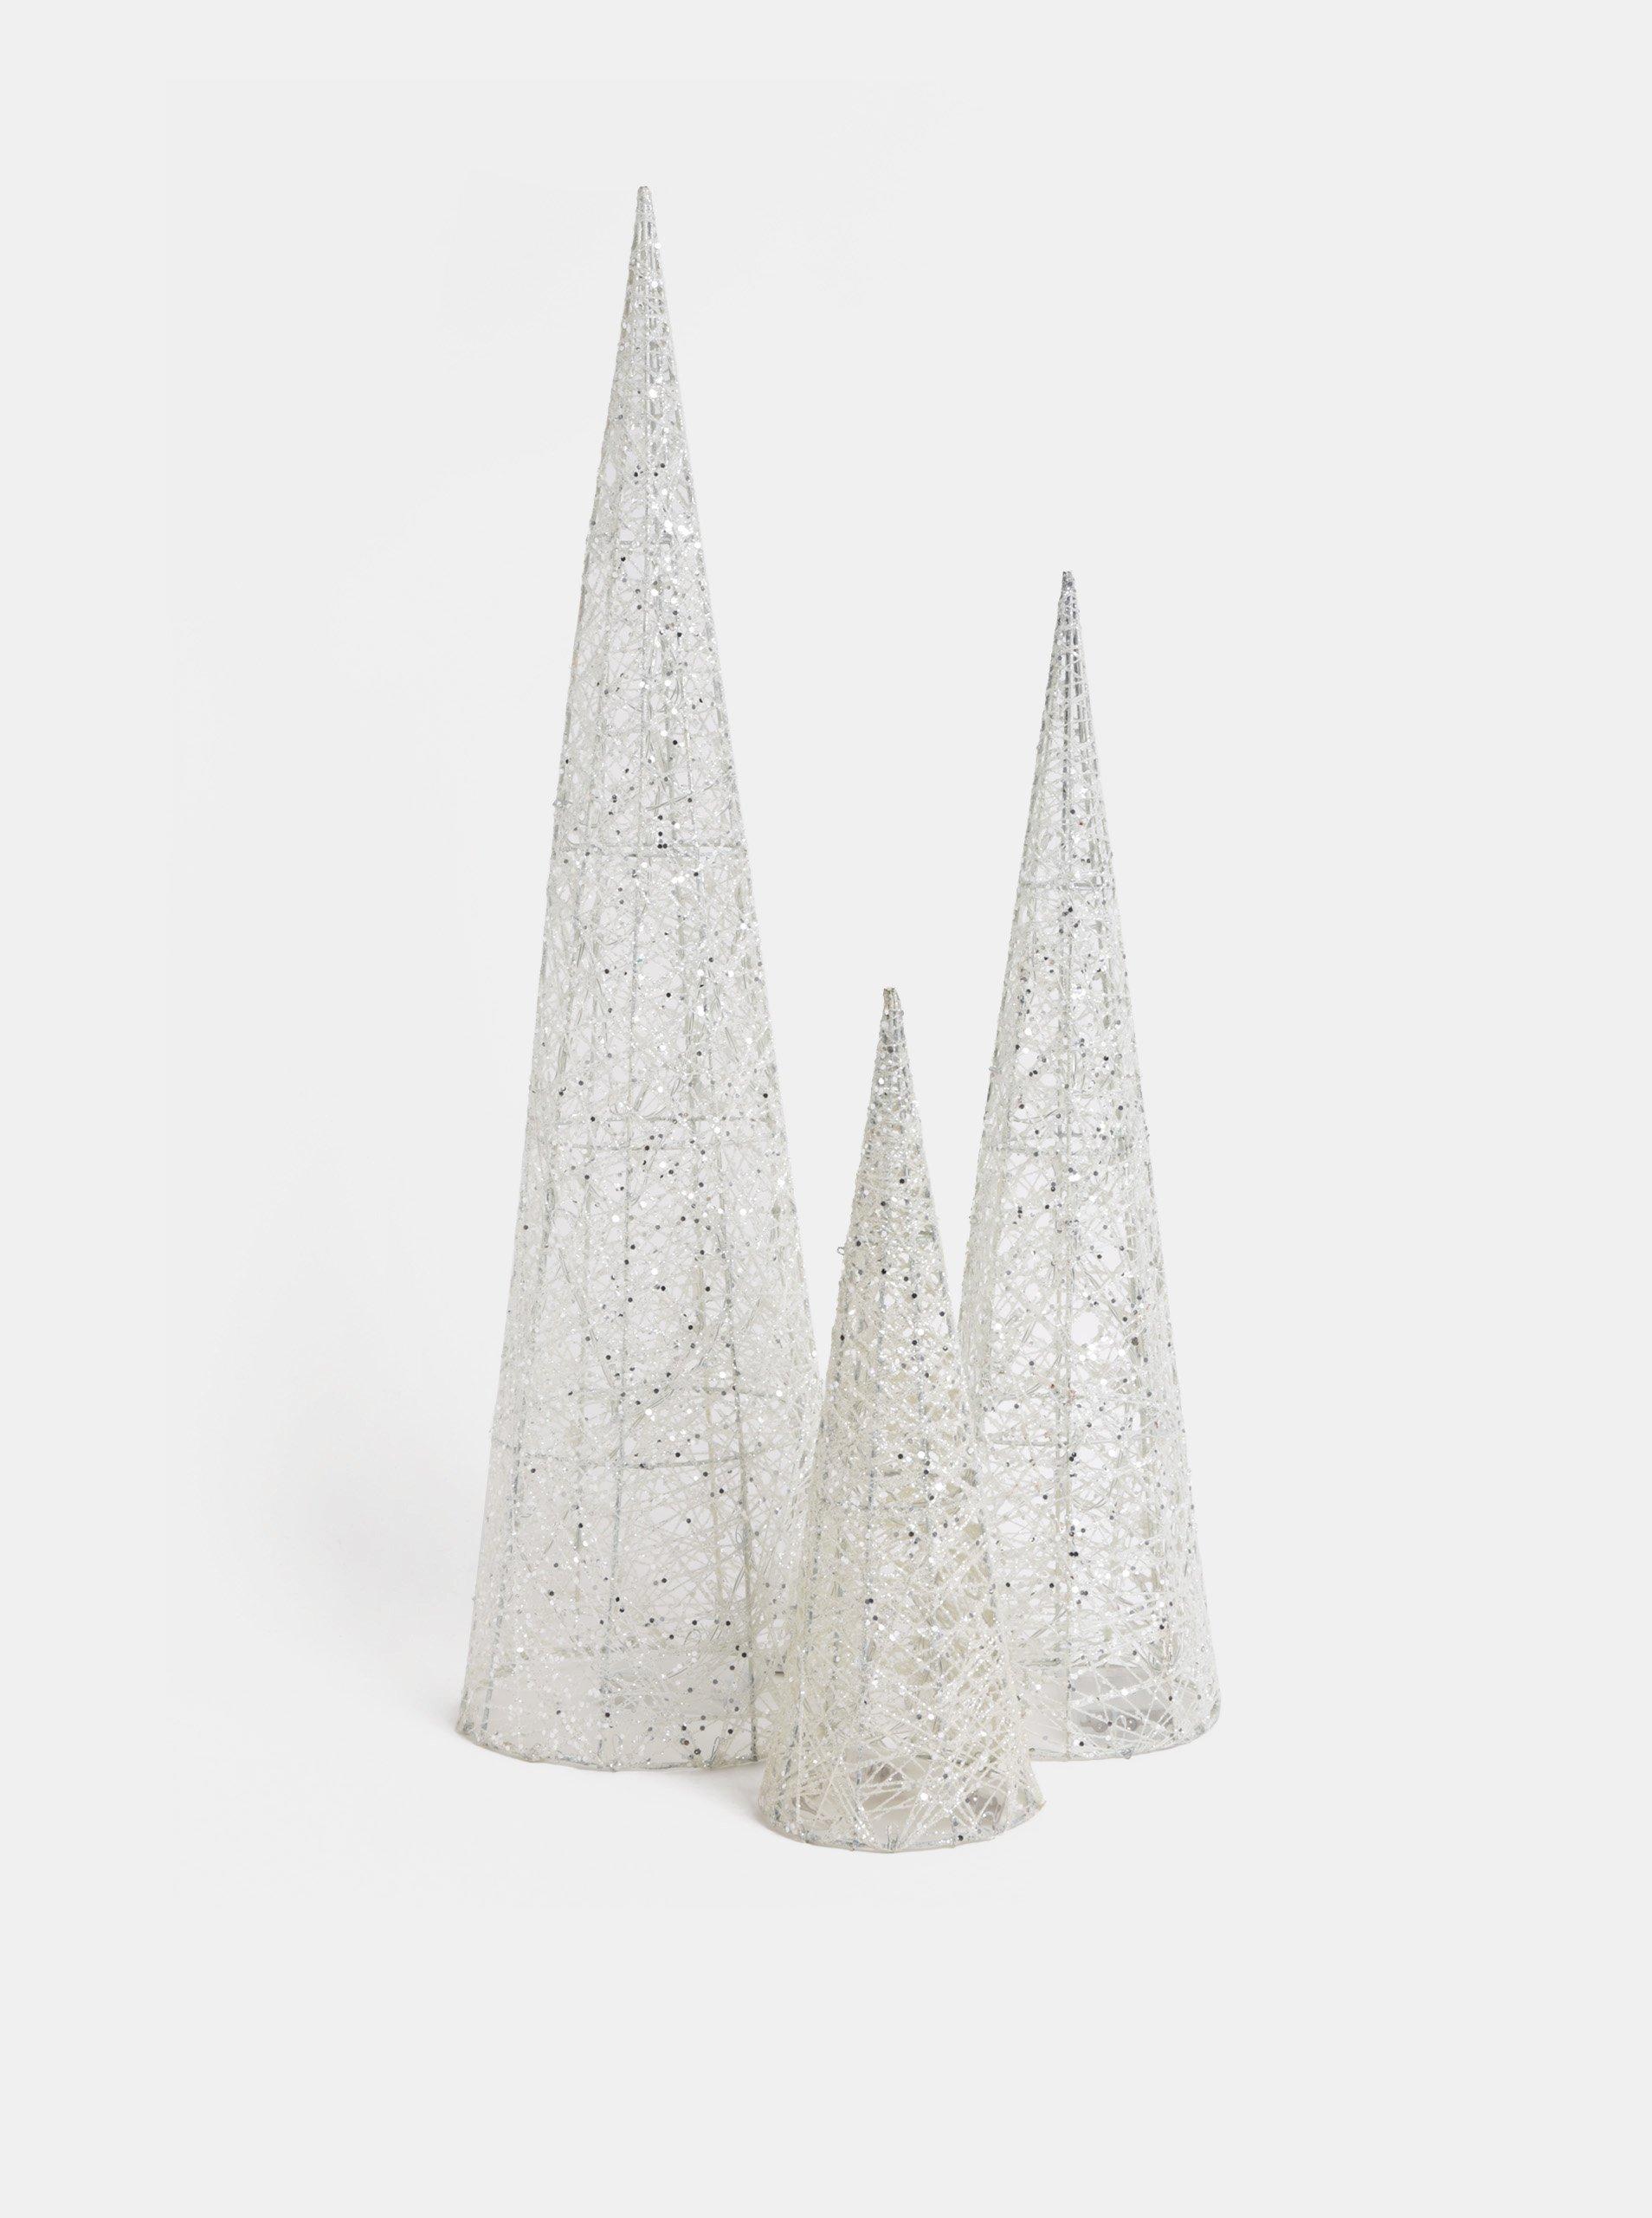 Biela kolekcia troch svietiacich stromov Dakls